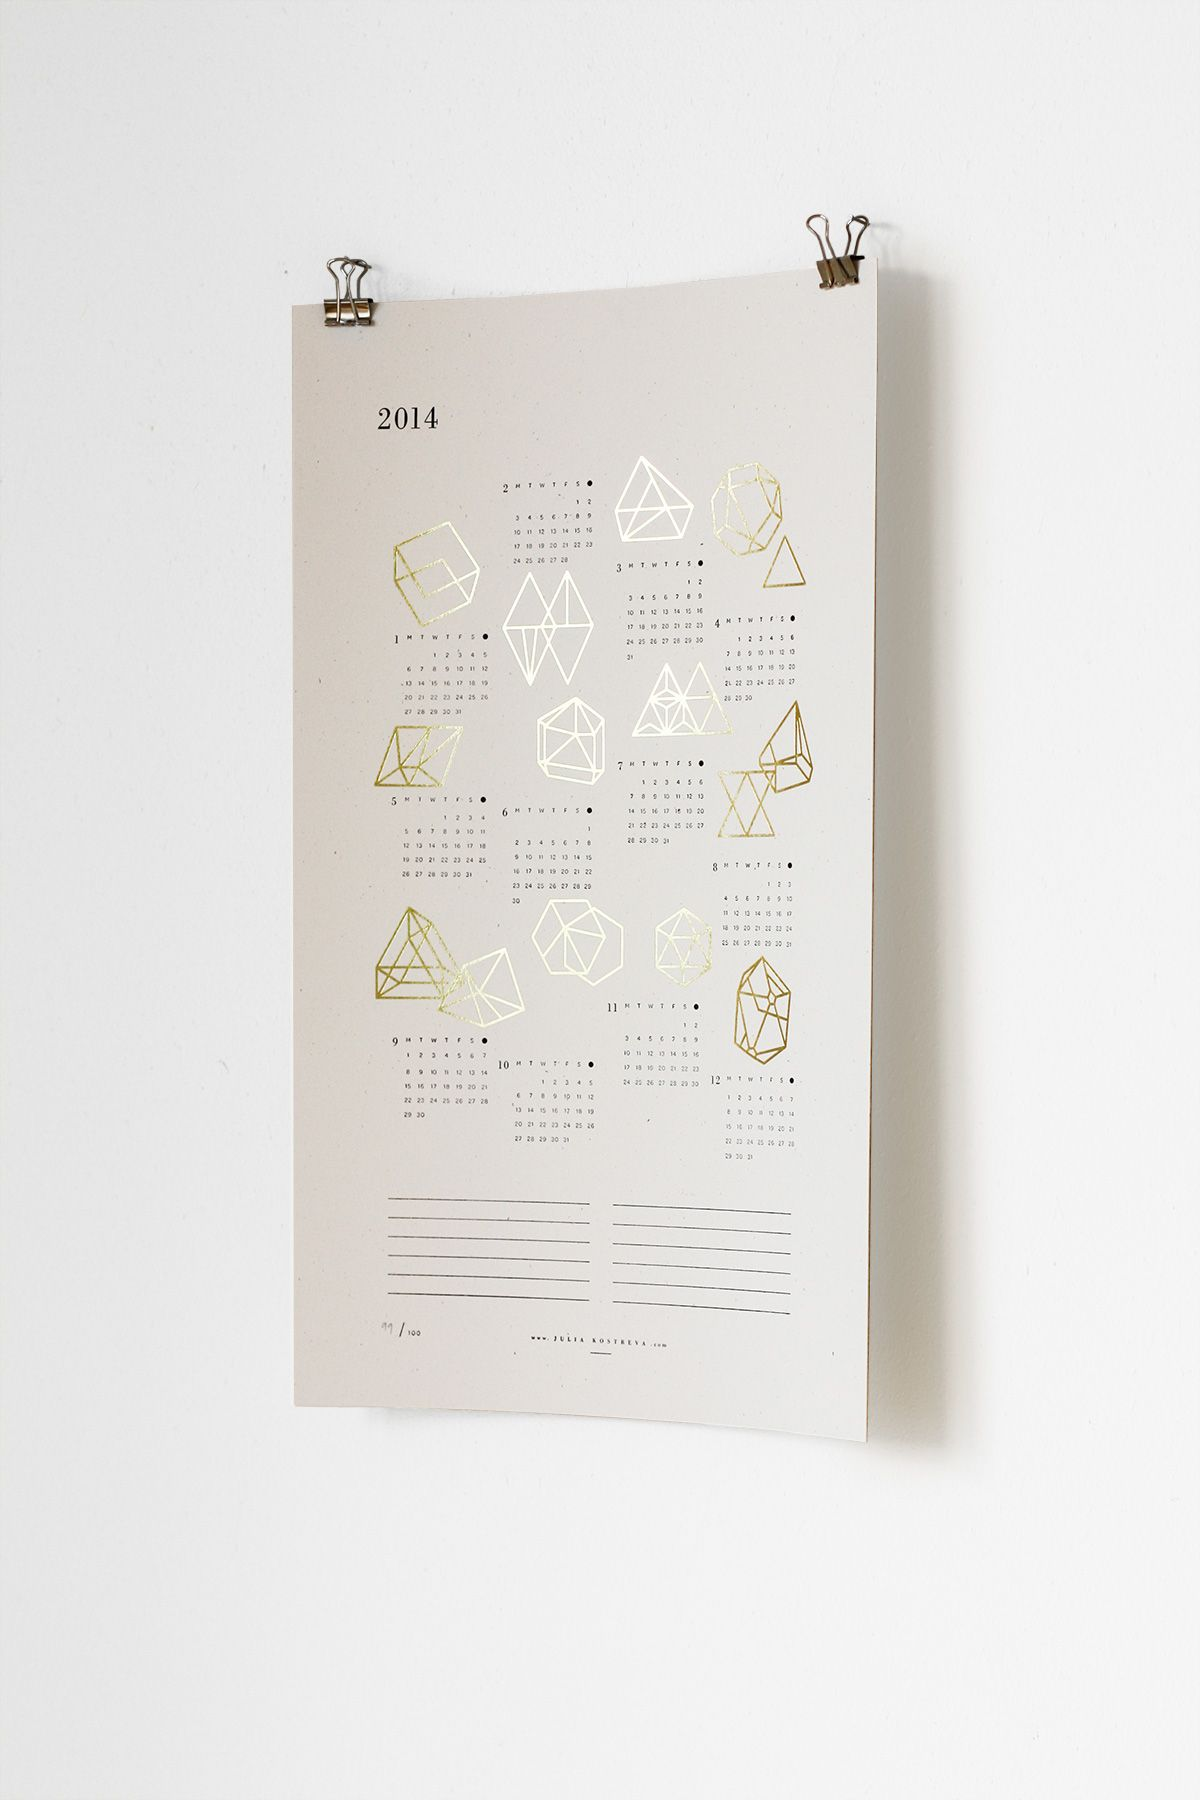 Gold Foil Prisms Calendar   Julia Kostreva Creative Studio (studio.juliakostreva.com)